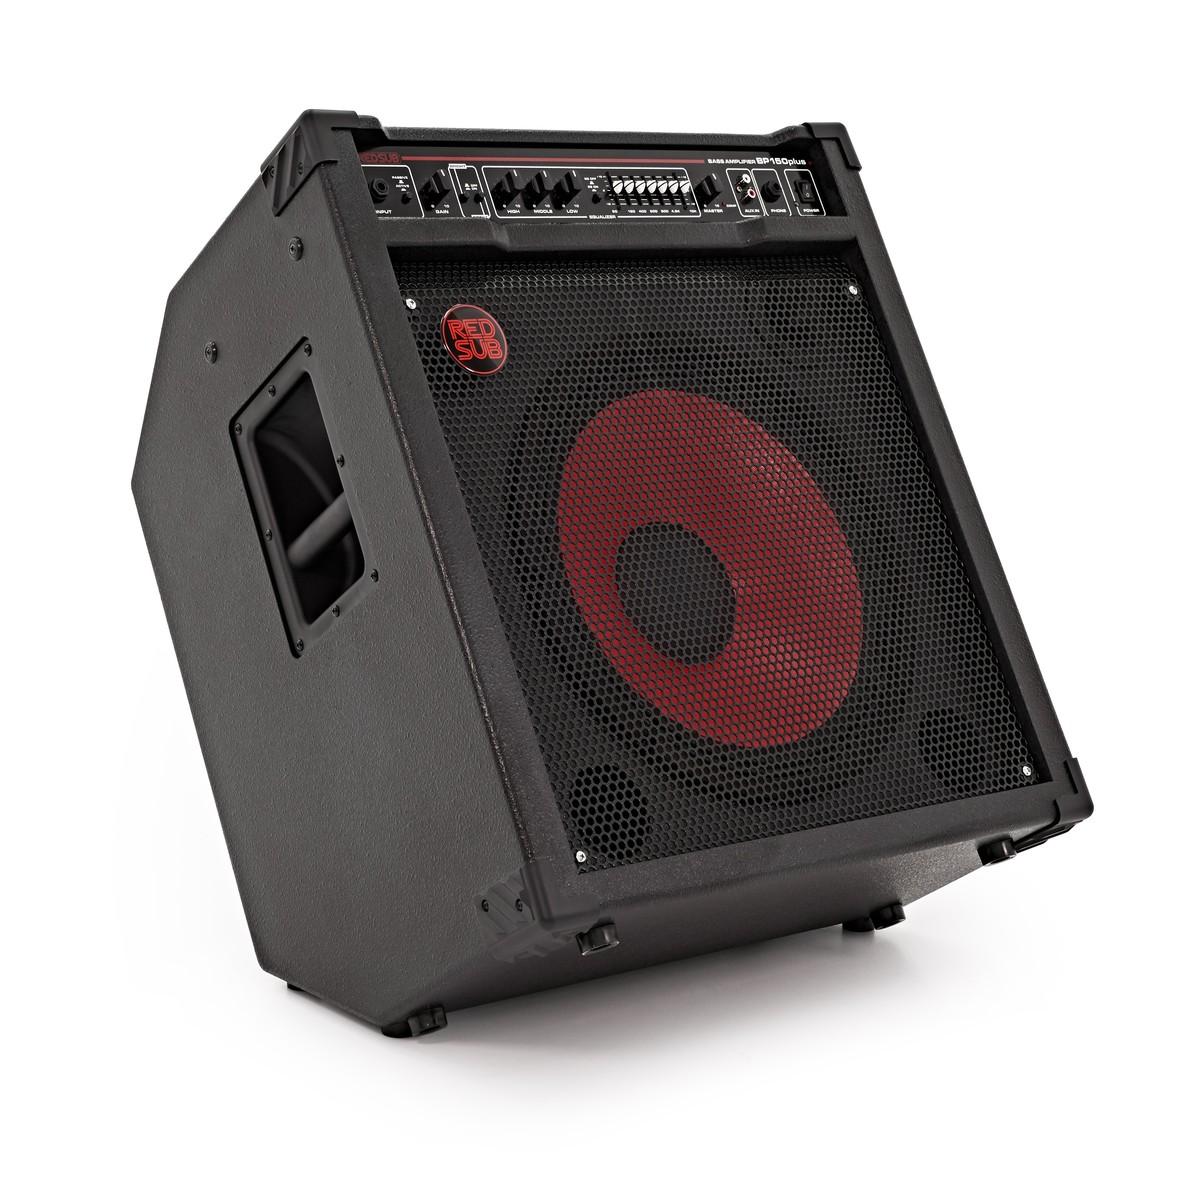 redsub bp150plus 150w bass guitar amplifier b stock at gear4music. Black Bedroom Furniture Sets. Home Design Ideas